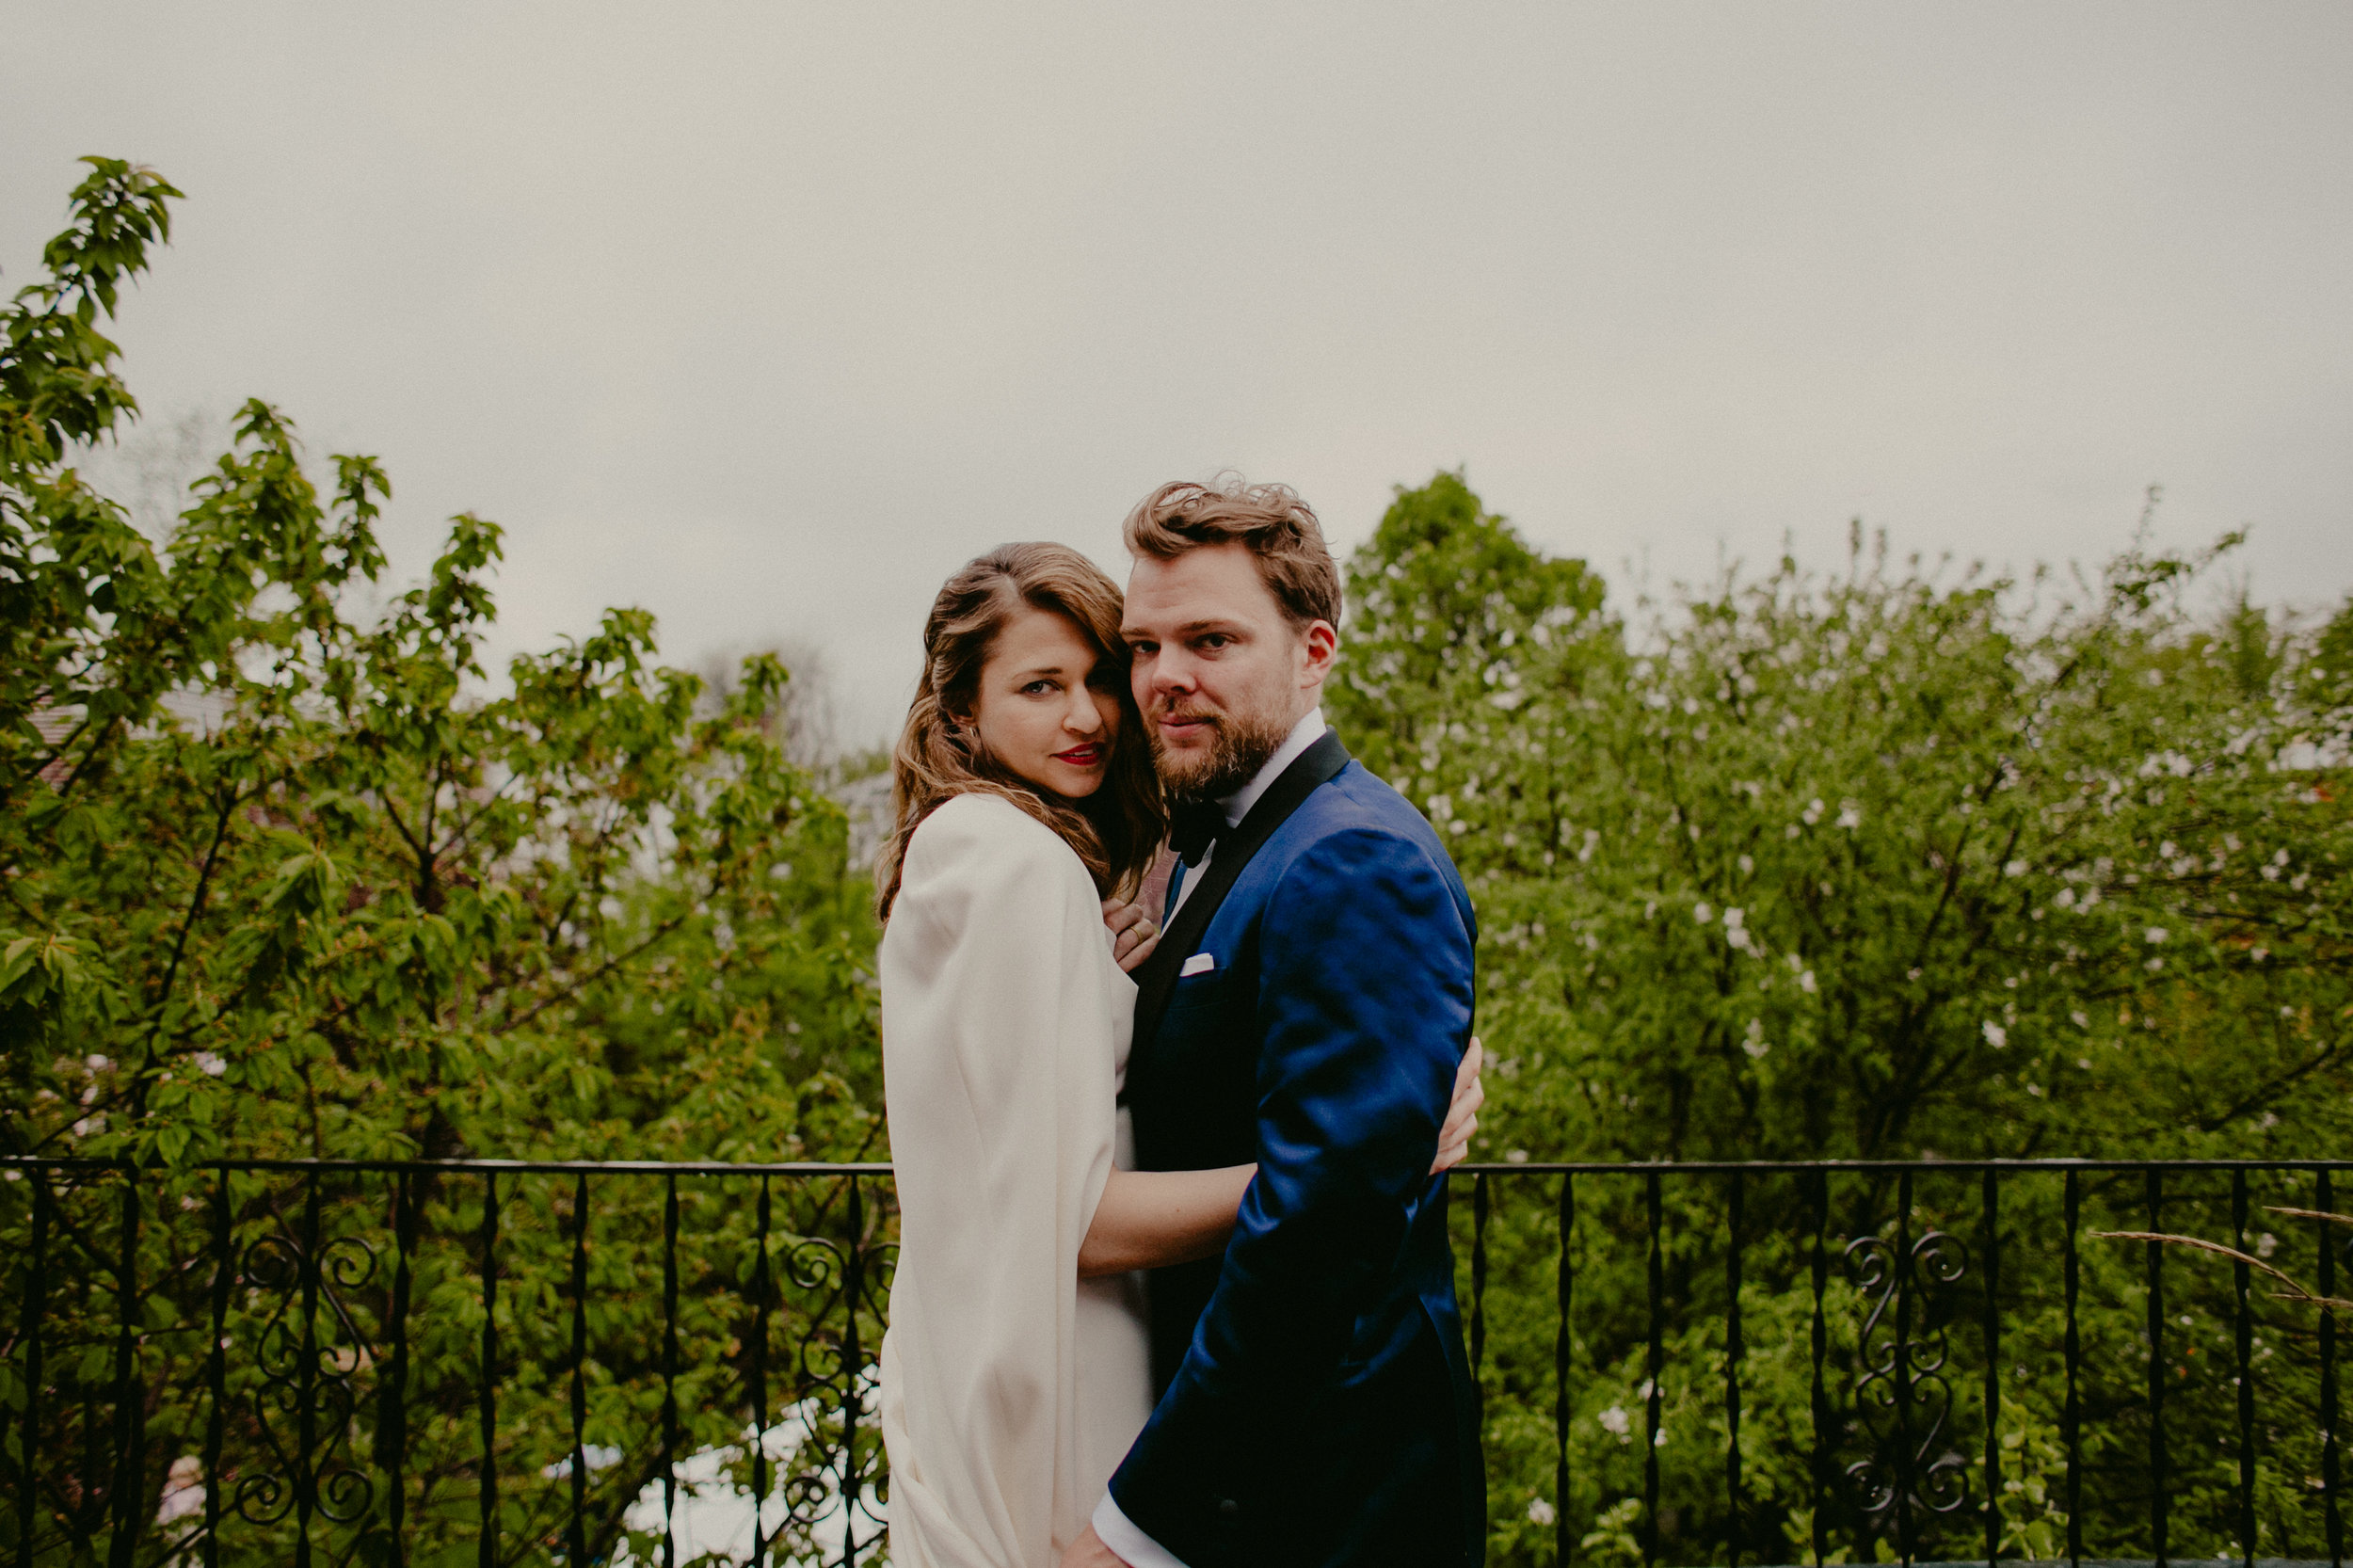 Tiger_House_The_Inn_at_Hudson-Wedding_Chellise_Michael_Photography-334.jpg